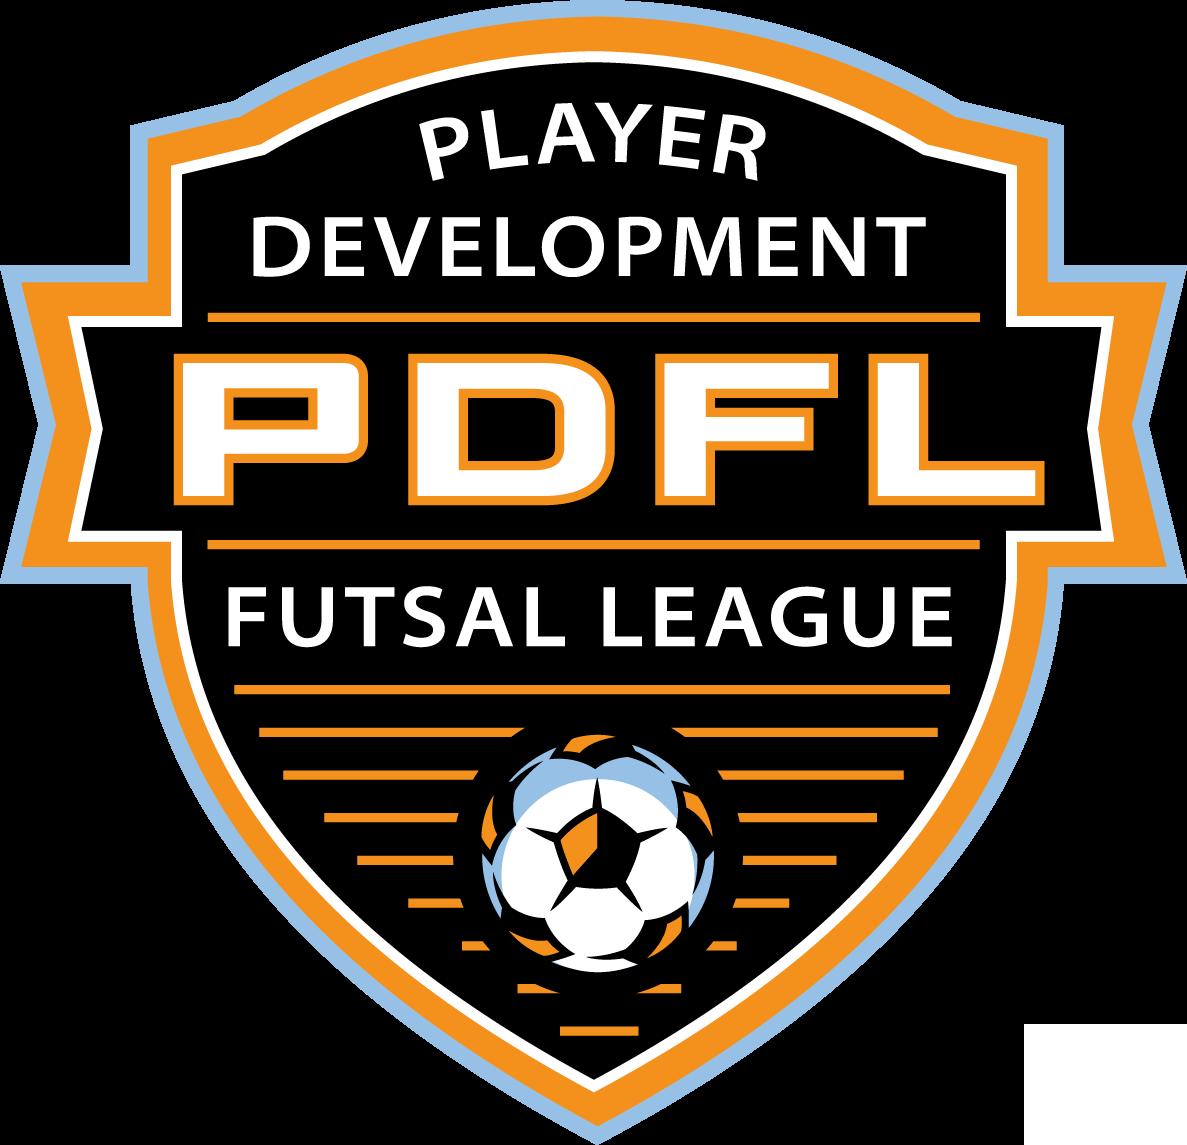 Logo Futsal Keren Png Paimin Gambar In 2021 Logo Football Logo Design Online Logo Design